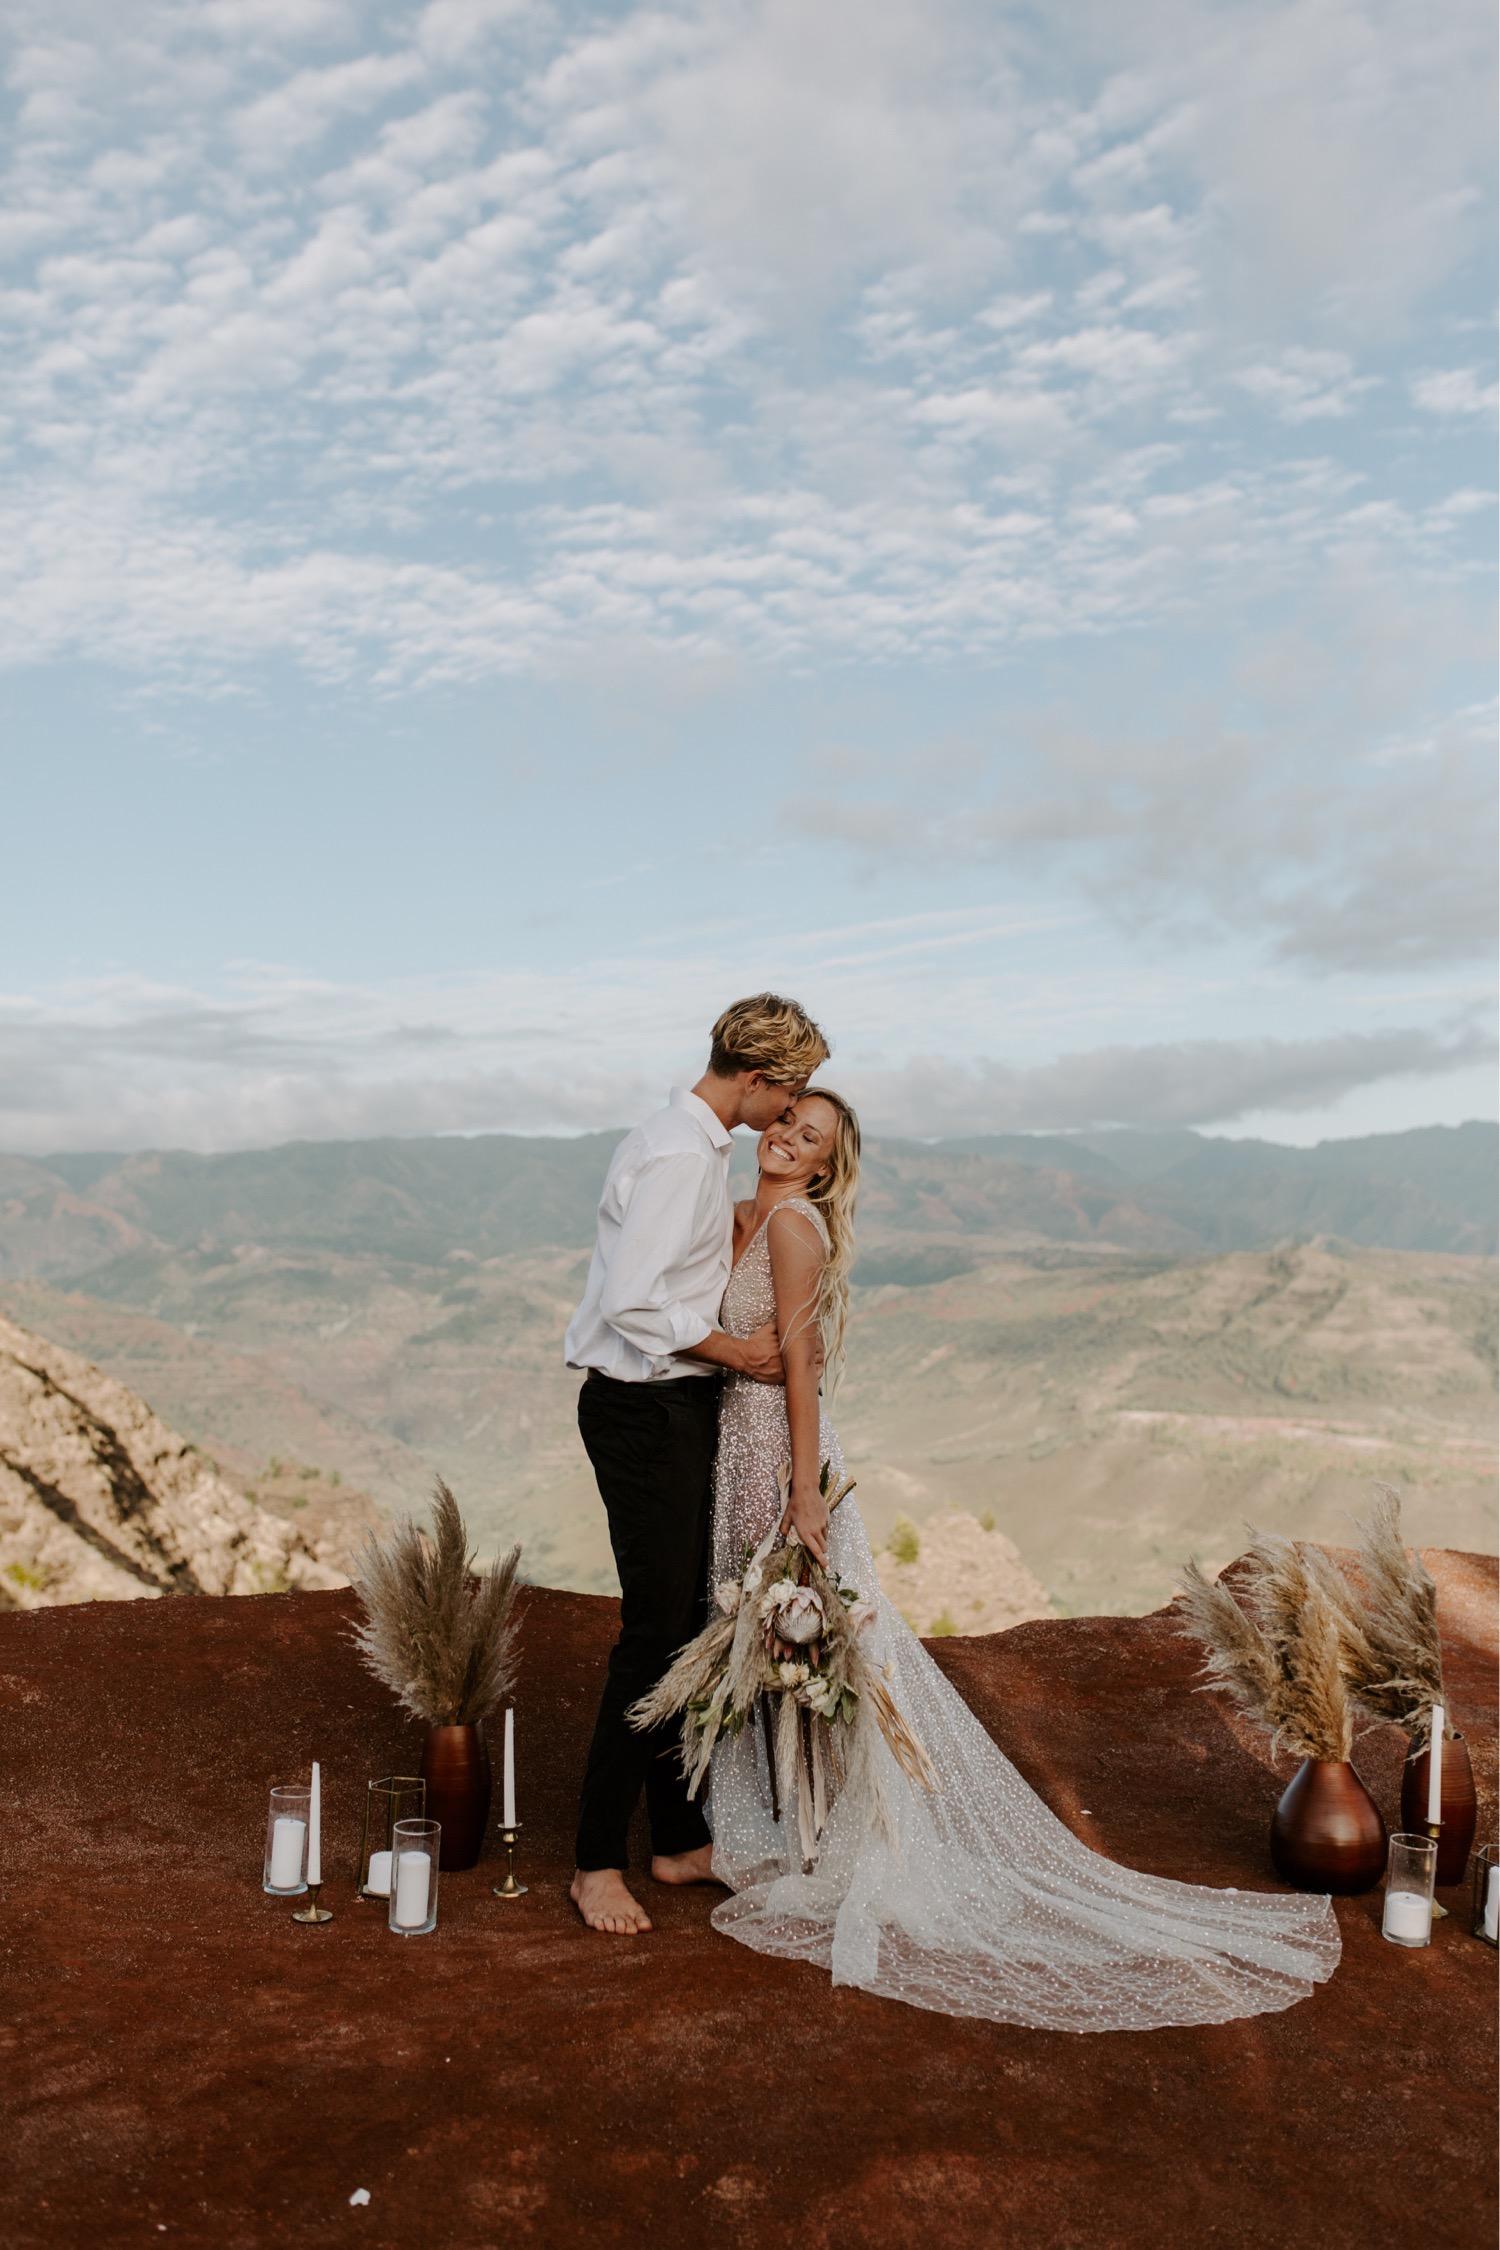 maia_chloe_photo_kauai_elopement_waimea_canyon_wedding